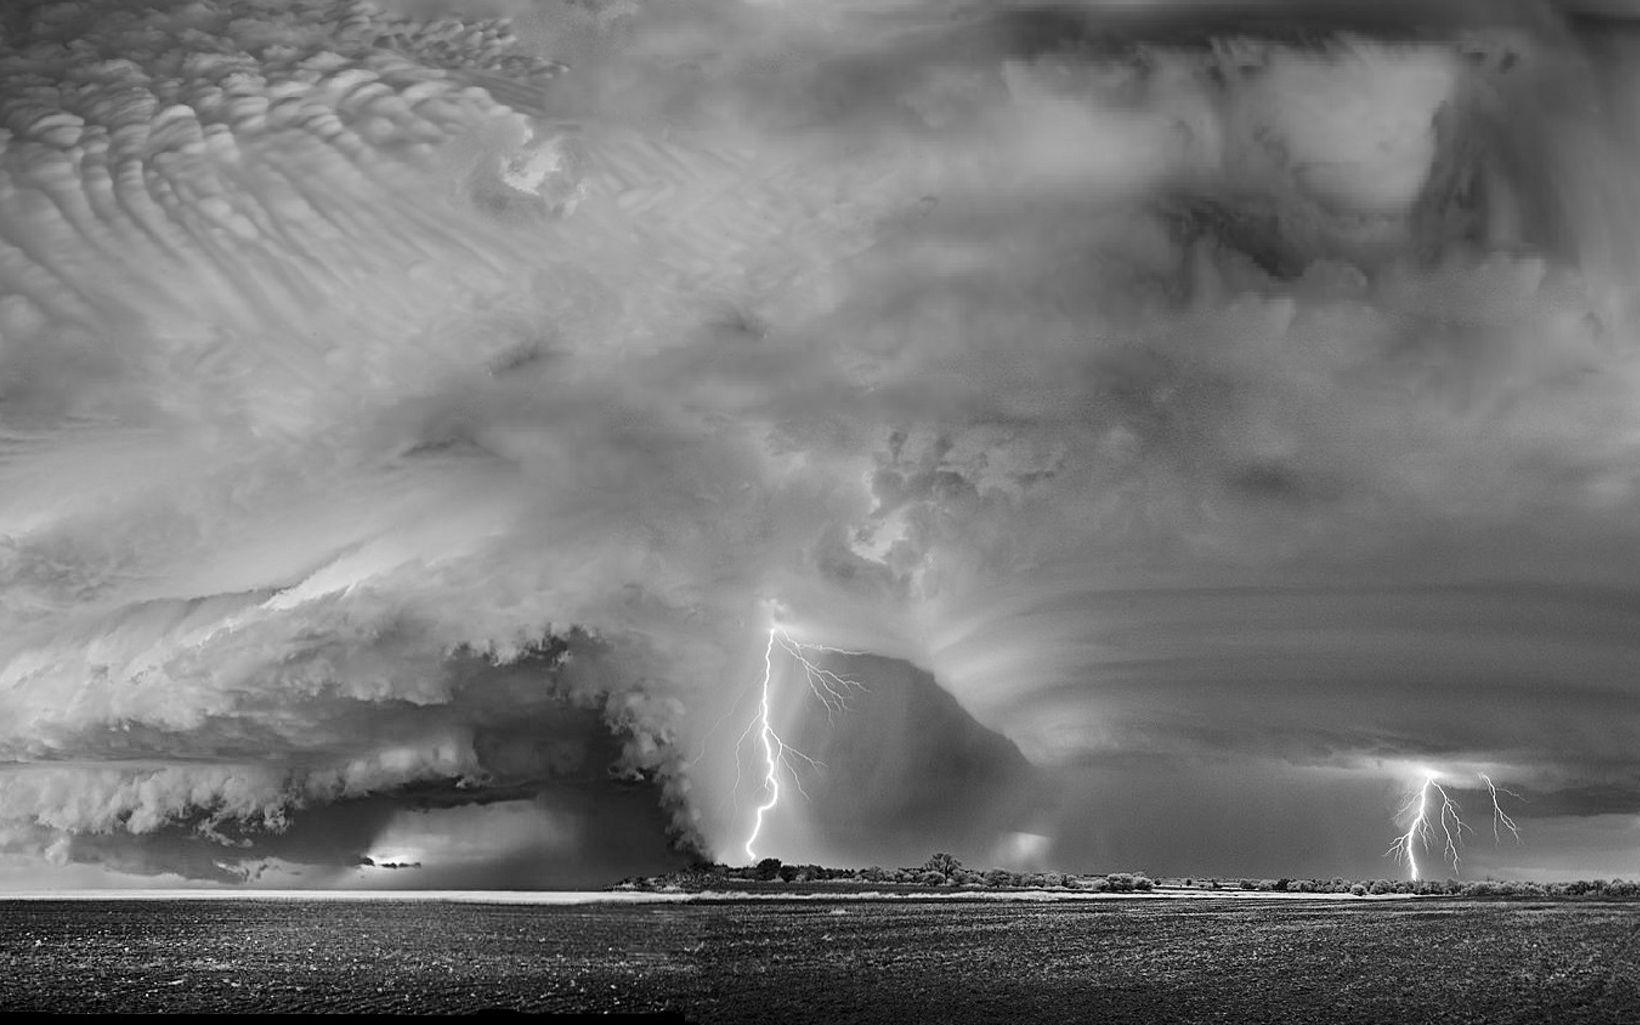 Tormenta de verano en Argentina